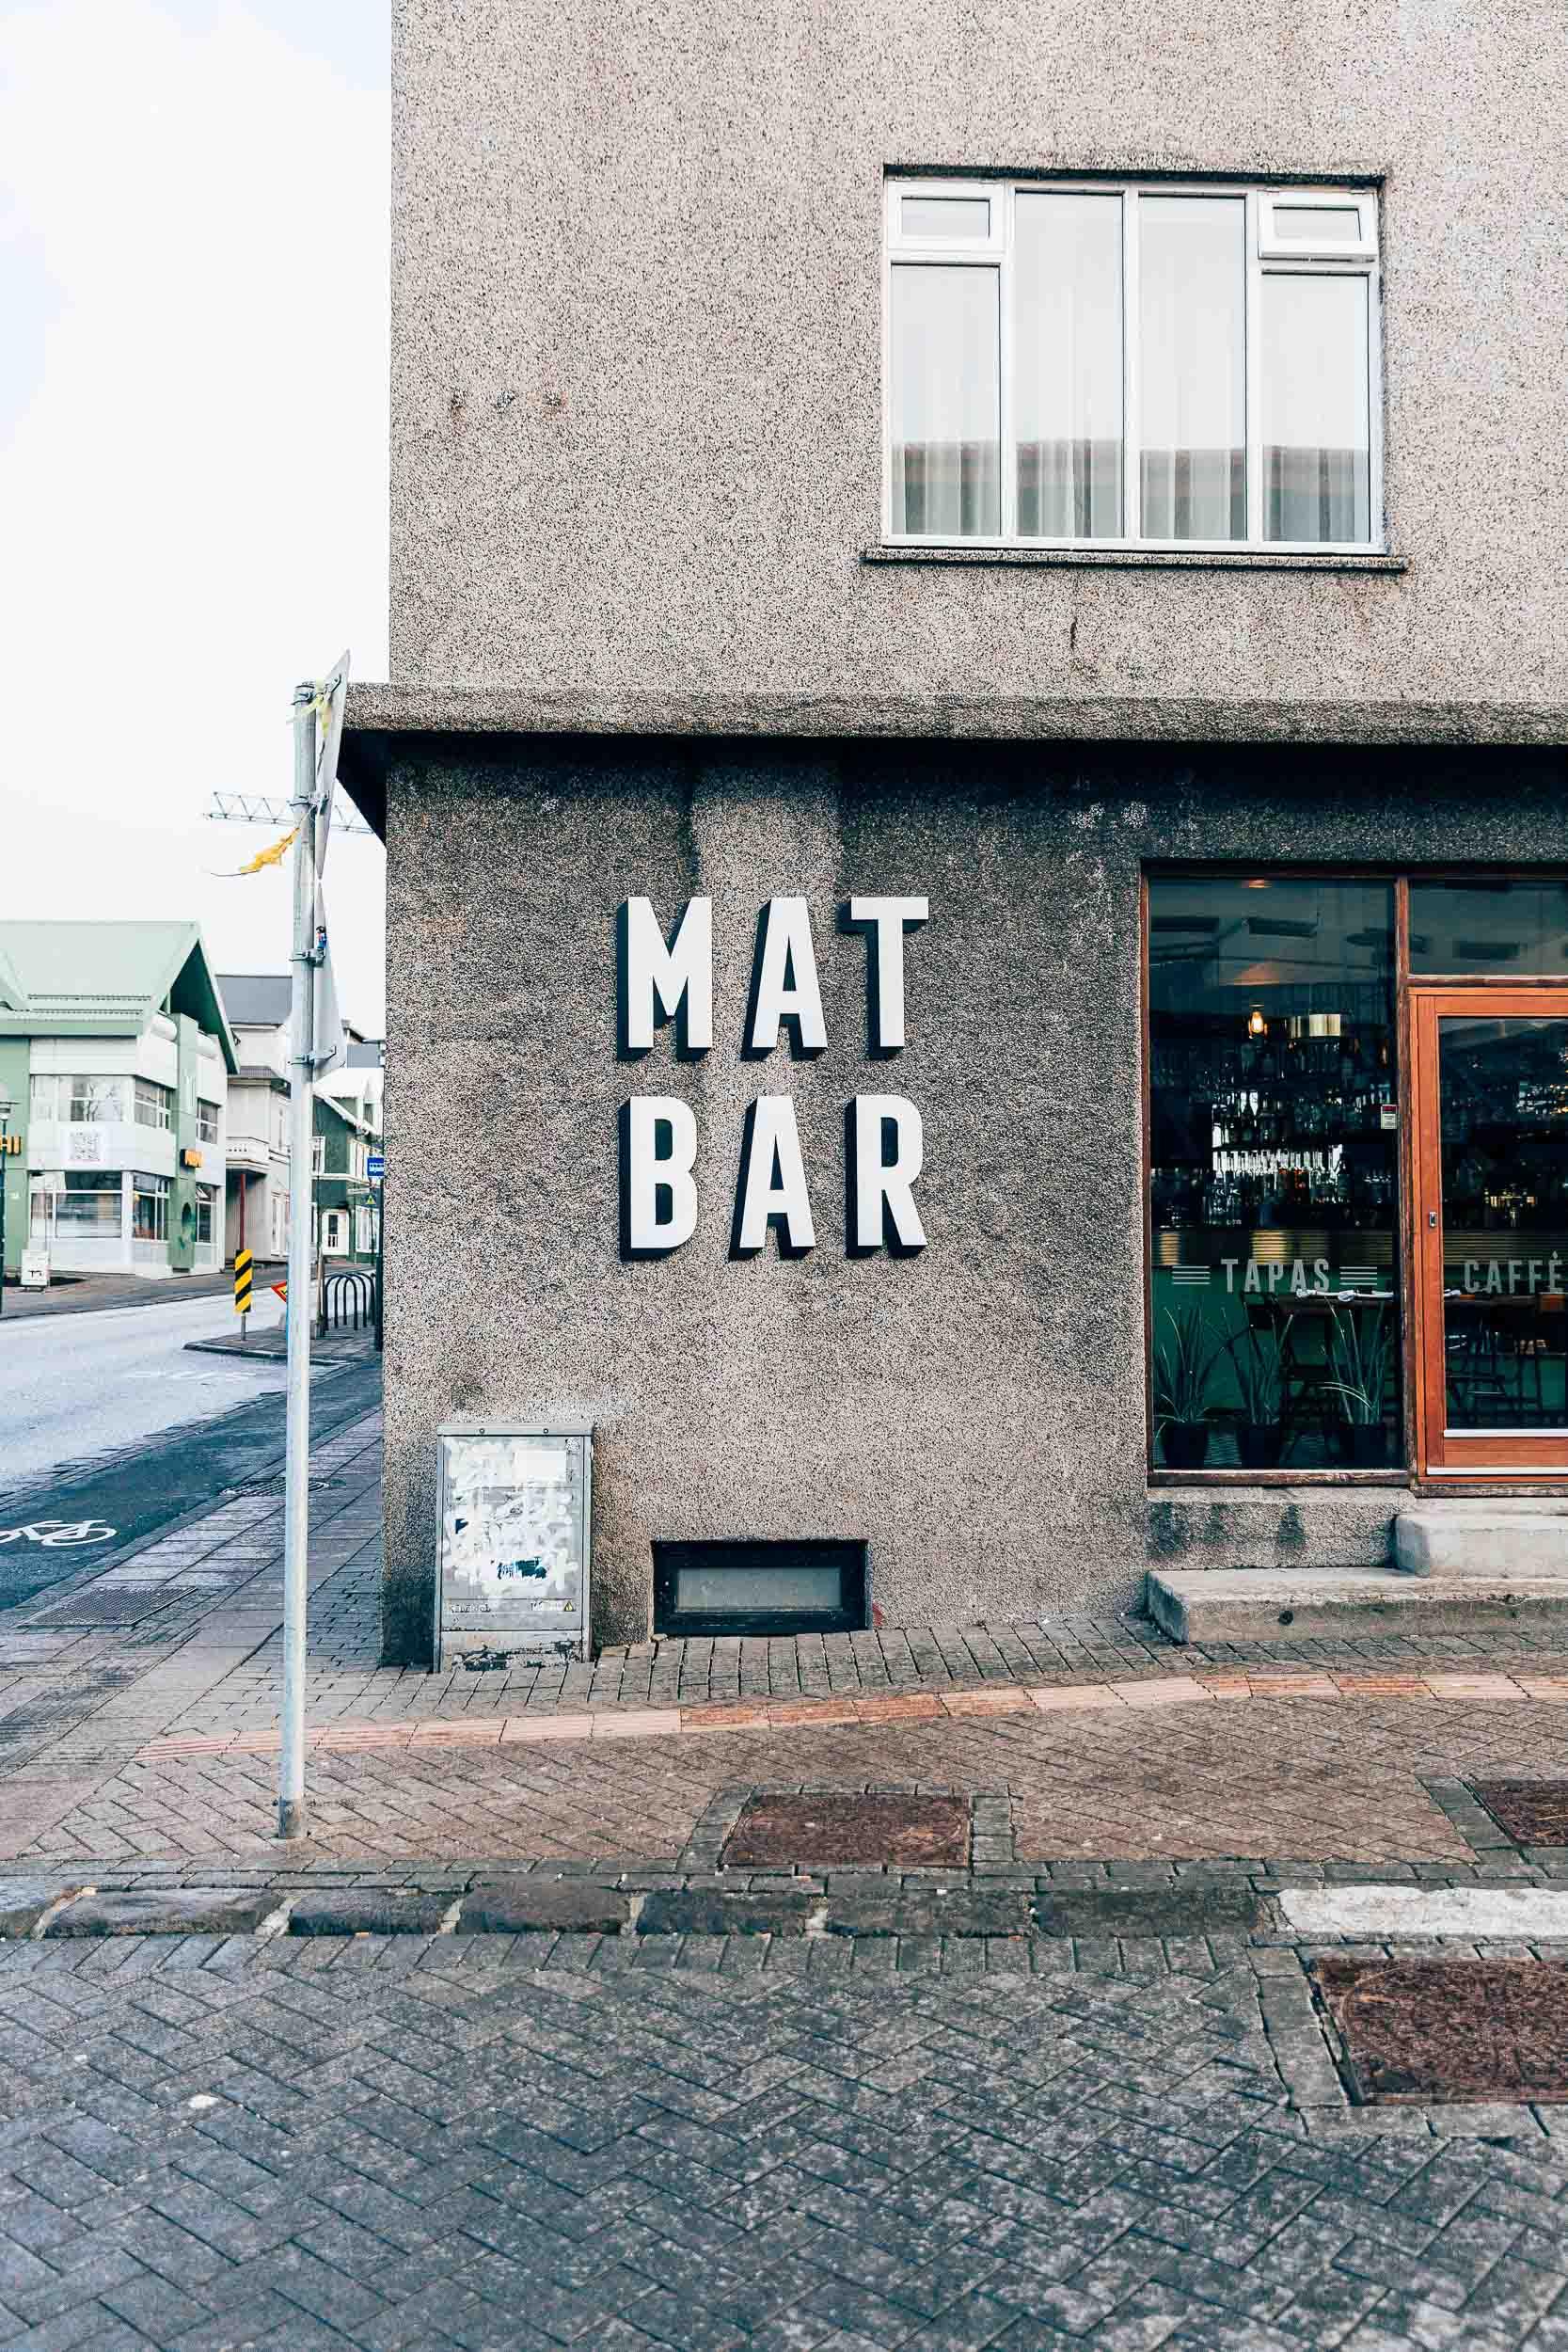 02_2019_Iceland-139.jpg